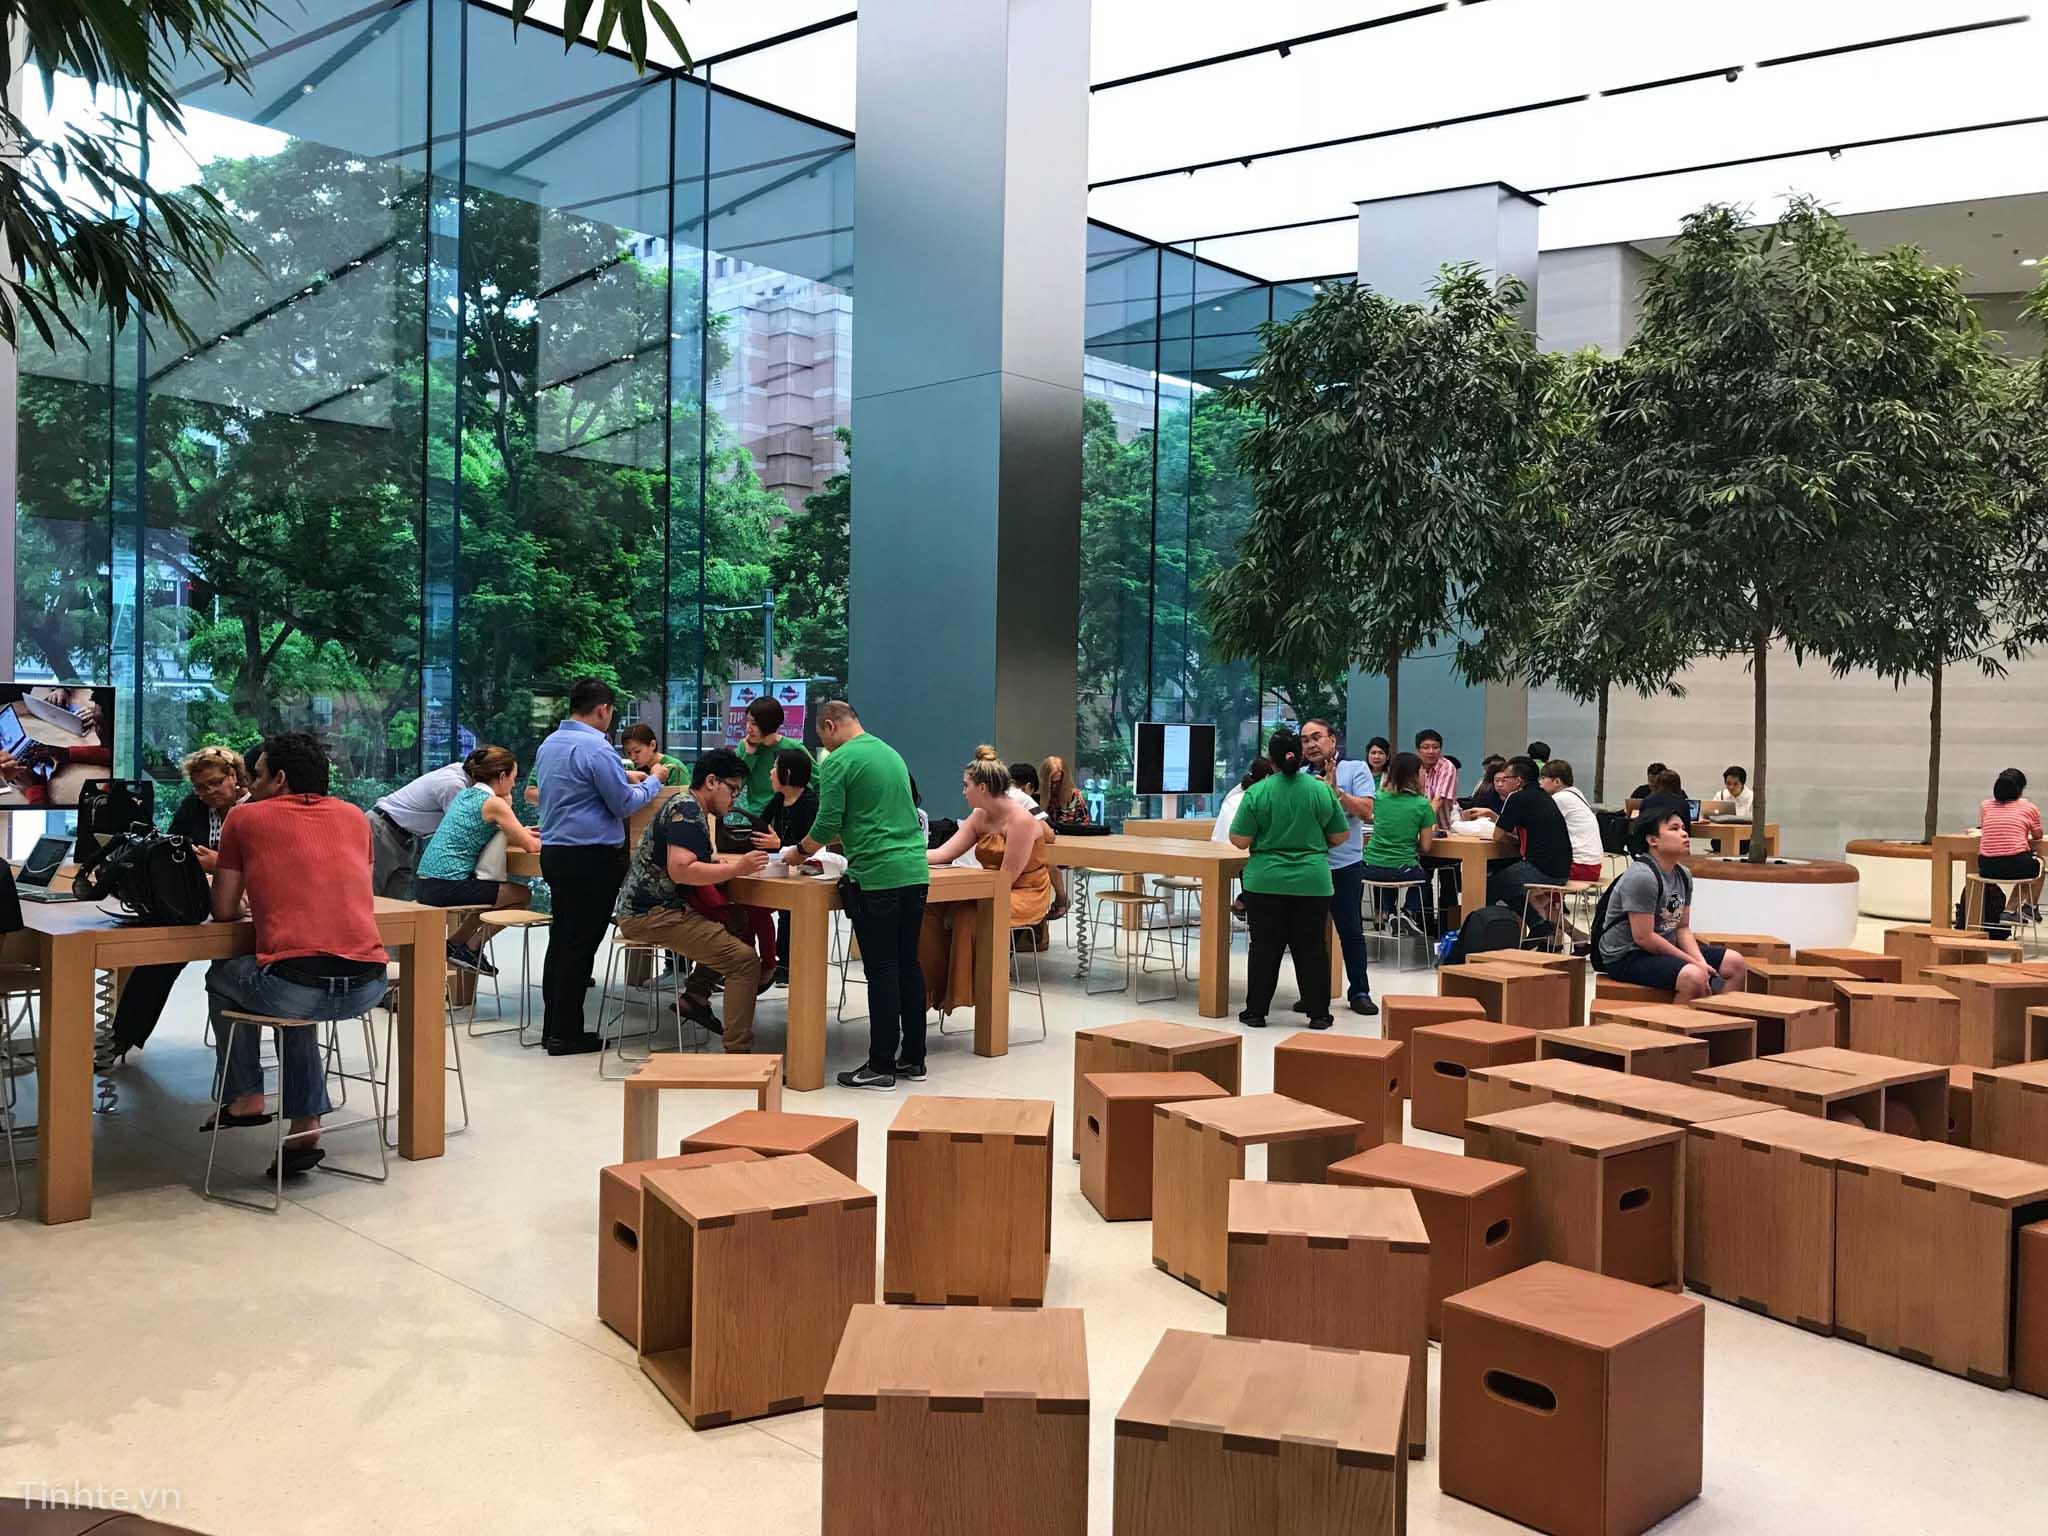 Apple-Store-Orchard-4.jpg